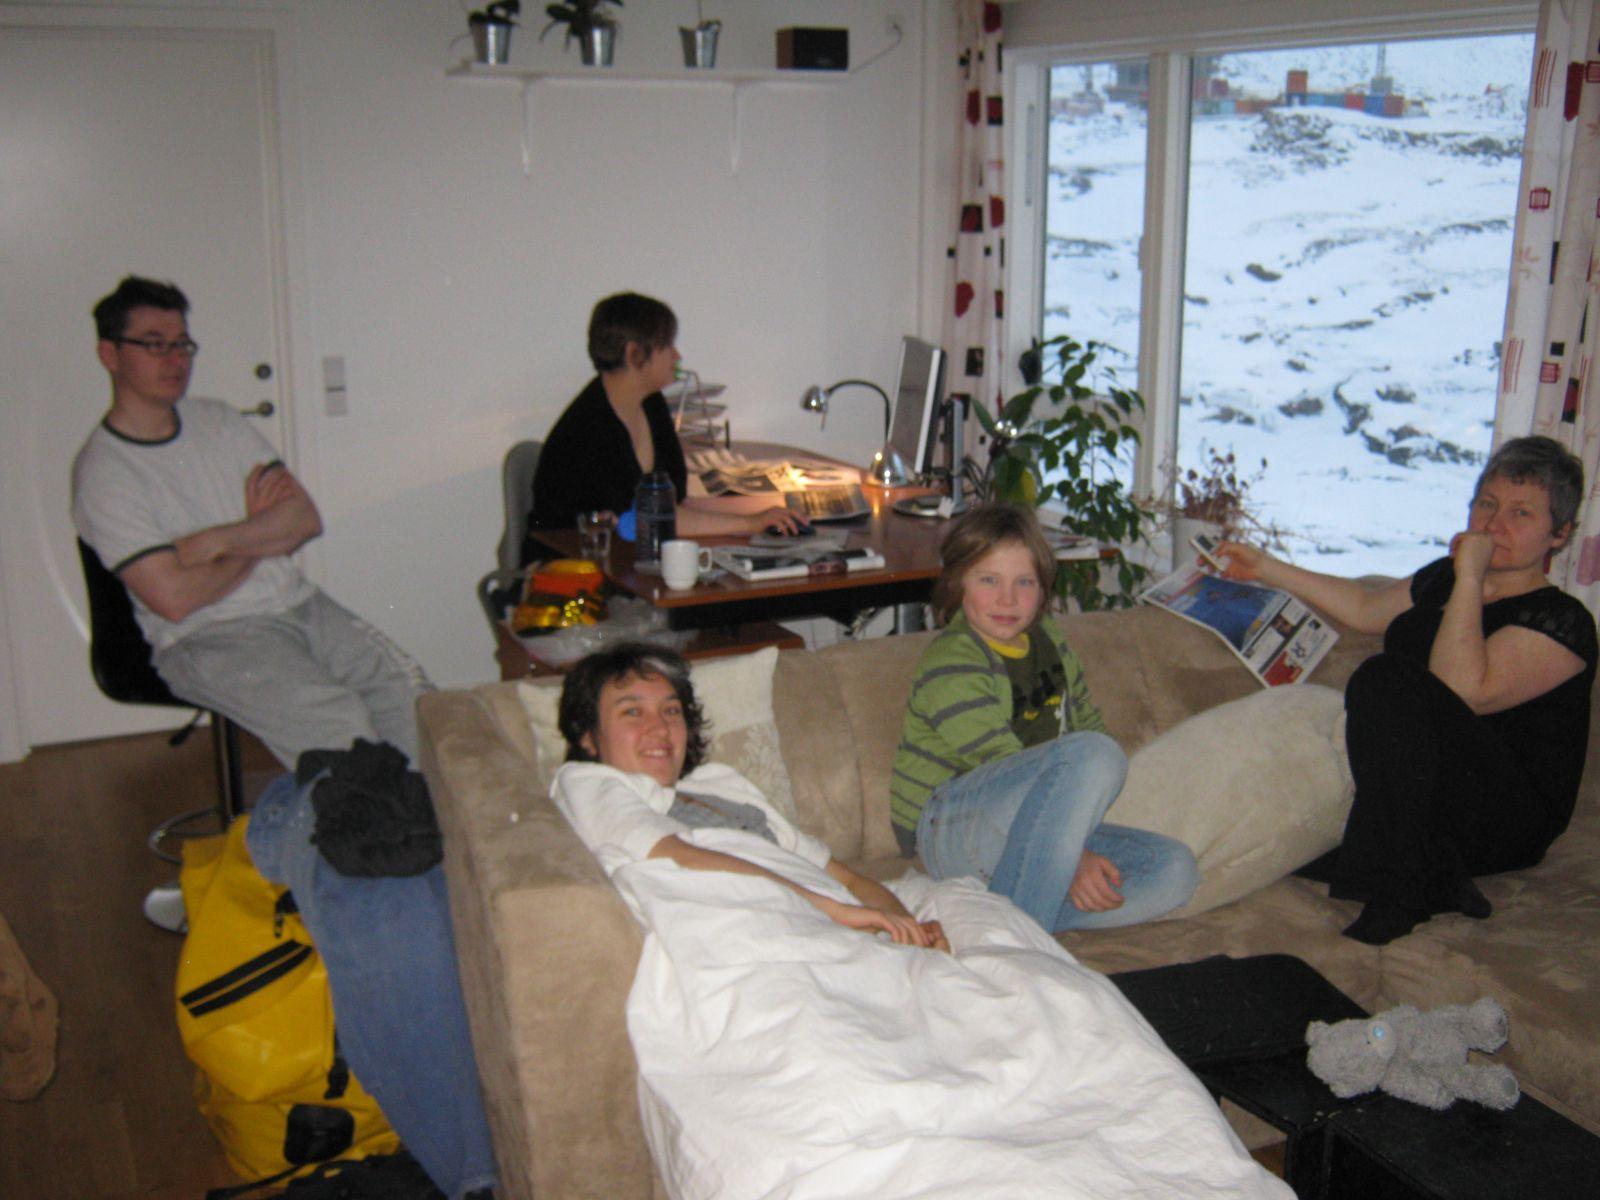 2009-11-07-0849_Ivalo Lynge Labansen; Jesper Eugenius Labansen; Maritha Eugenius Labansen; Mette Labansen; Rumle La